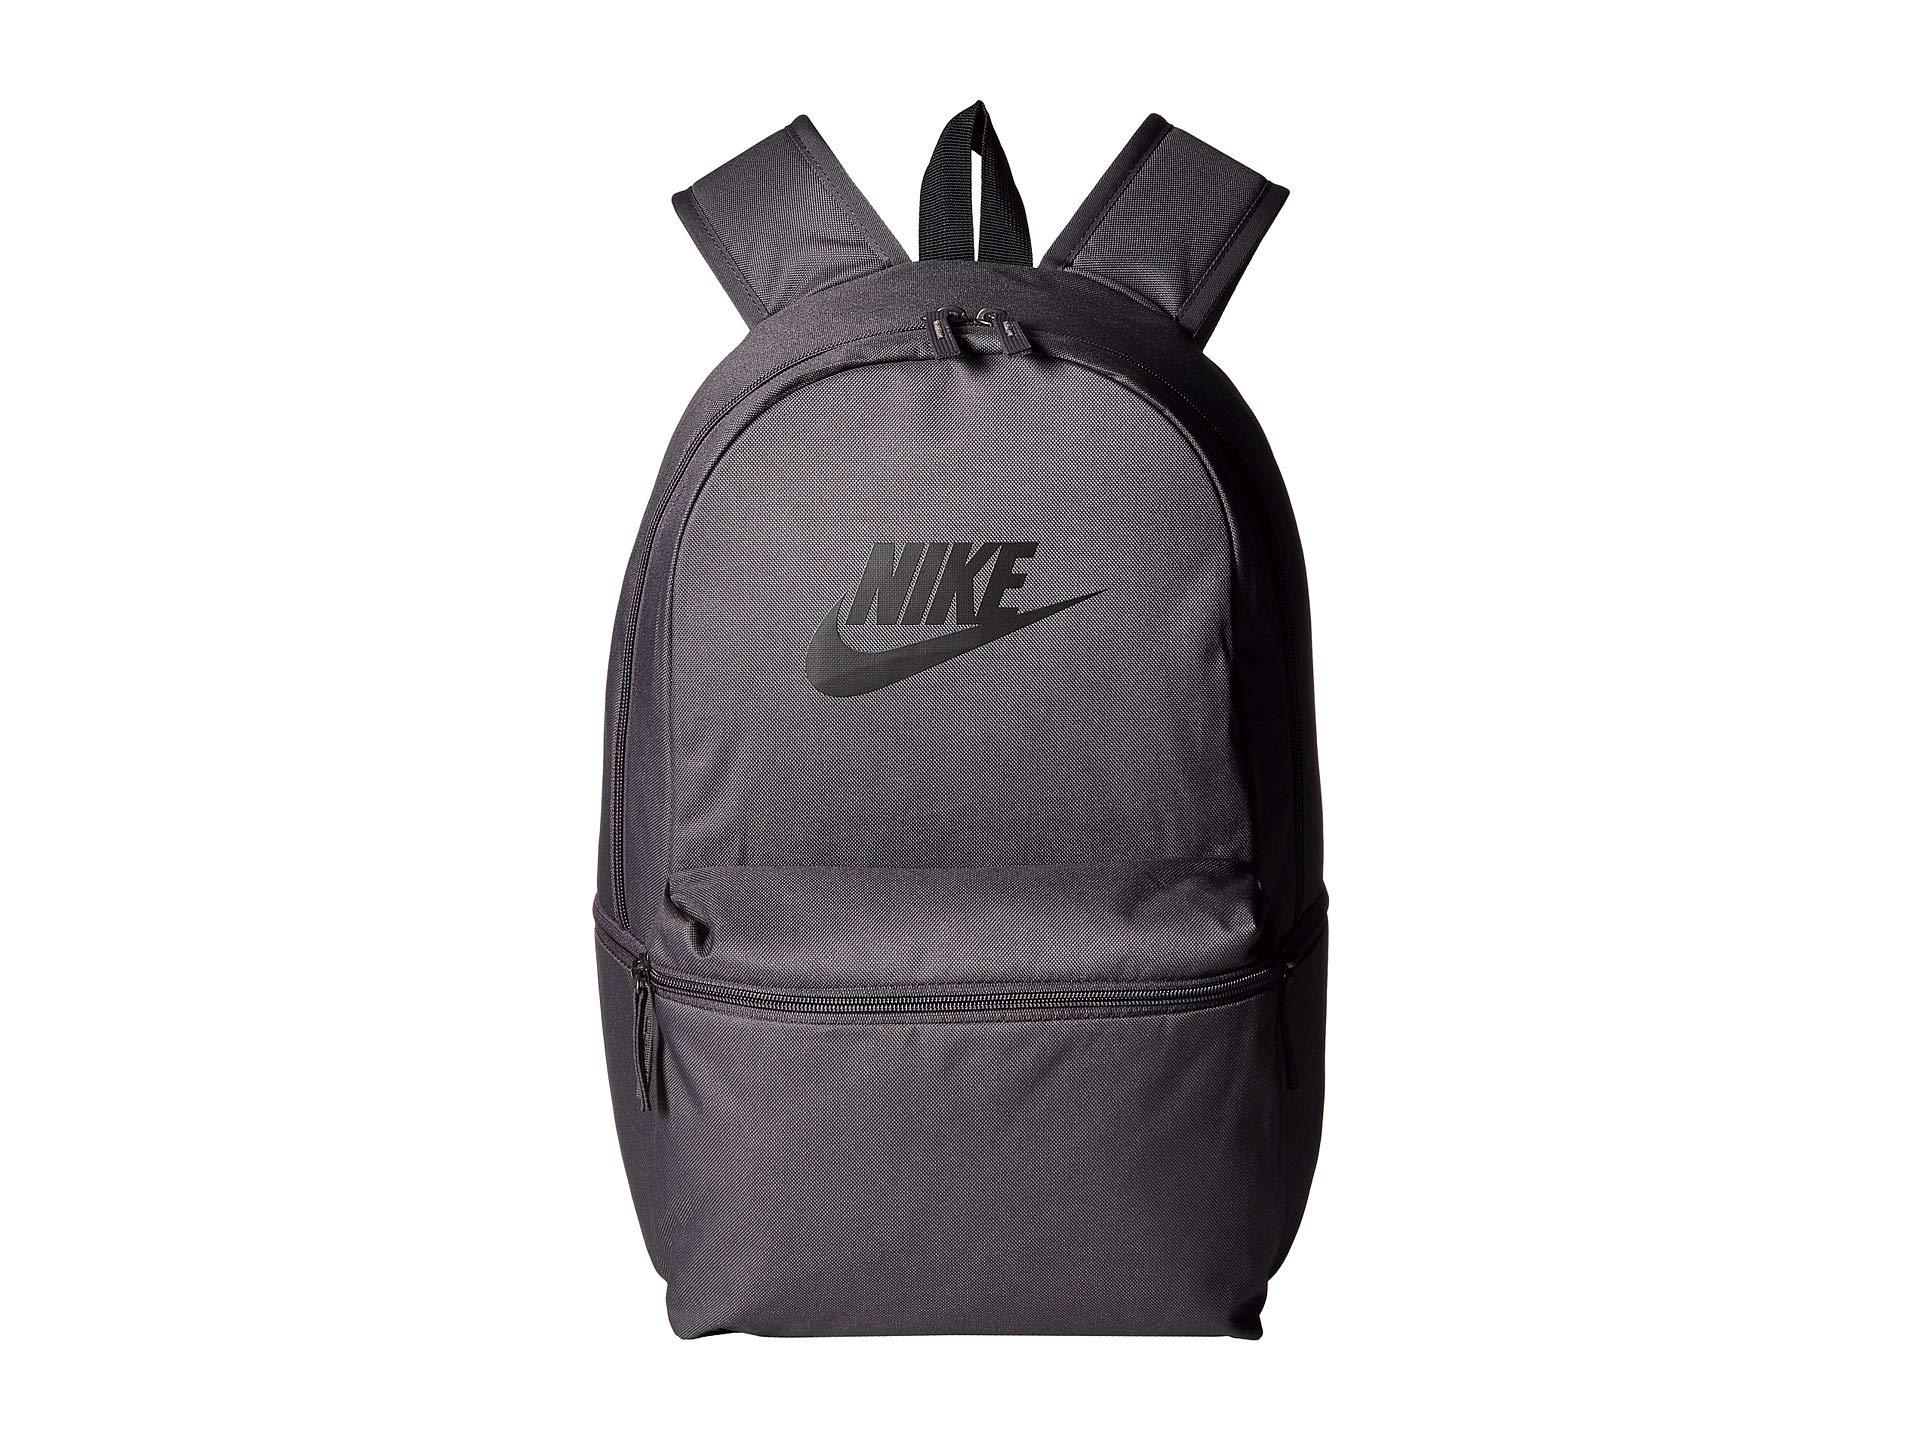 1417c16444cb Grey Backpack Heritage Backpacks Thunder black Nike Solid black qSICxwxFg